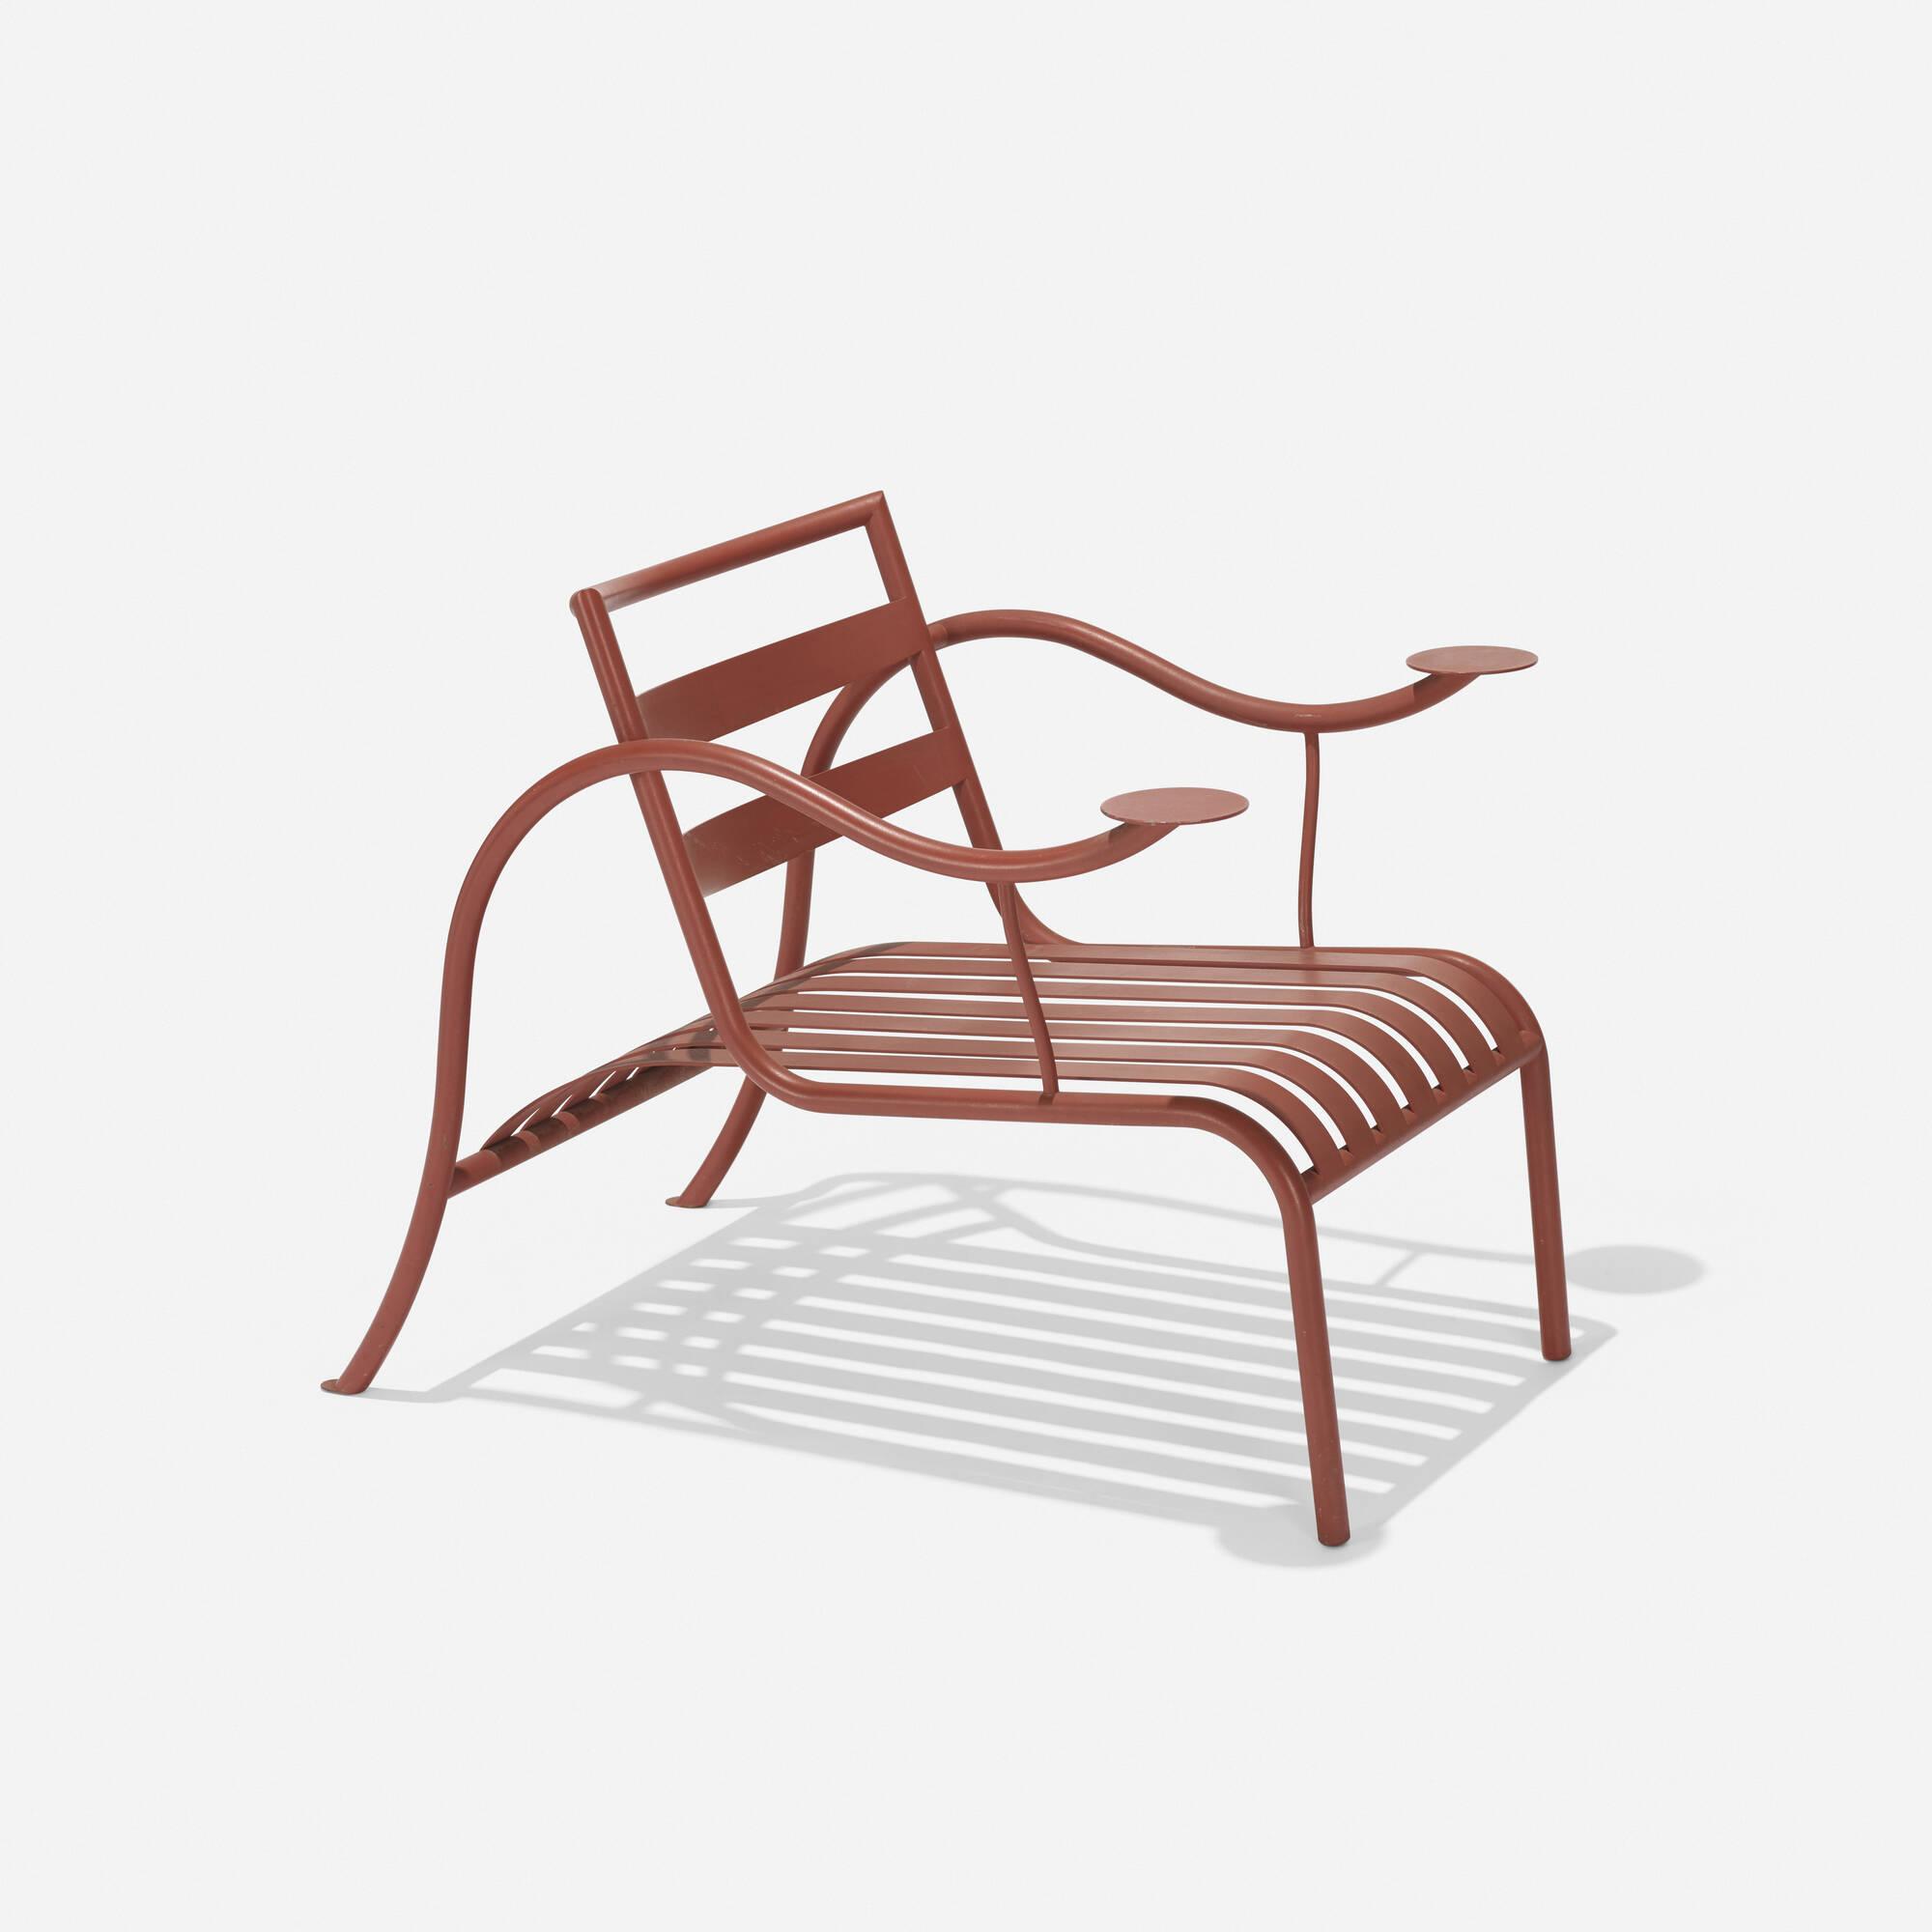 339: Jasper Morrison / Thinking Manu0027s Chair (1 Of ...